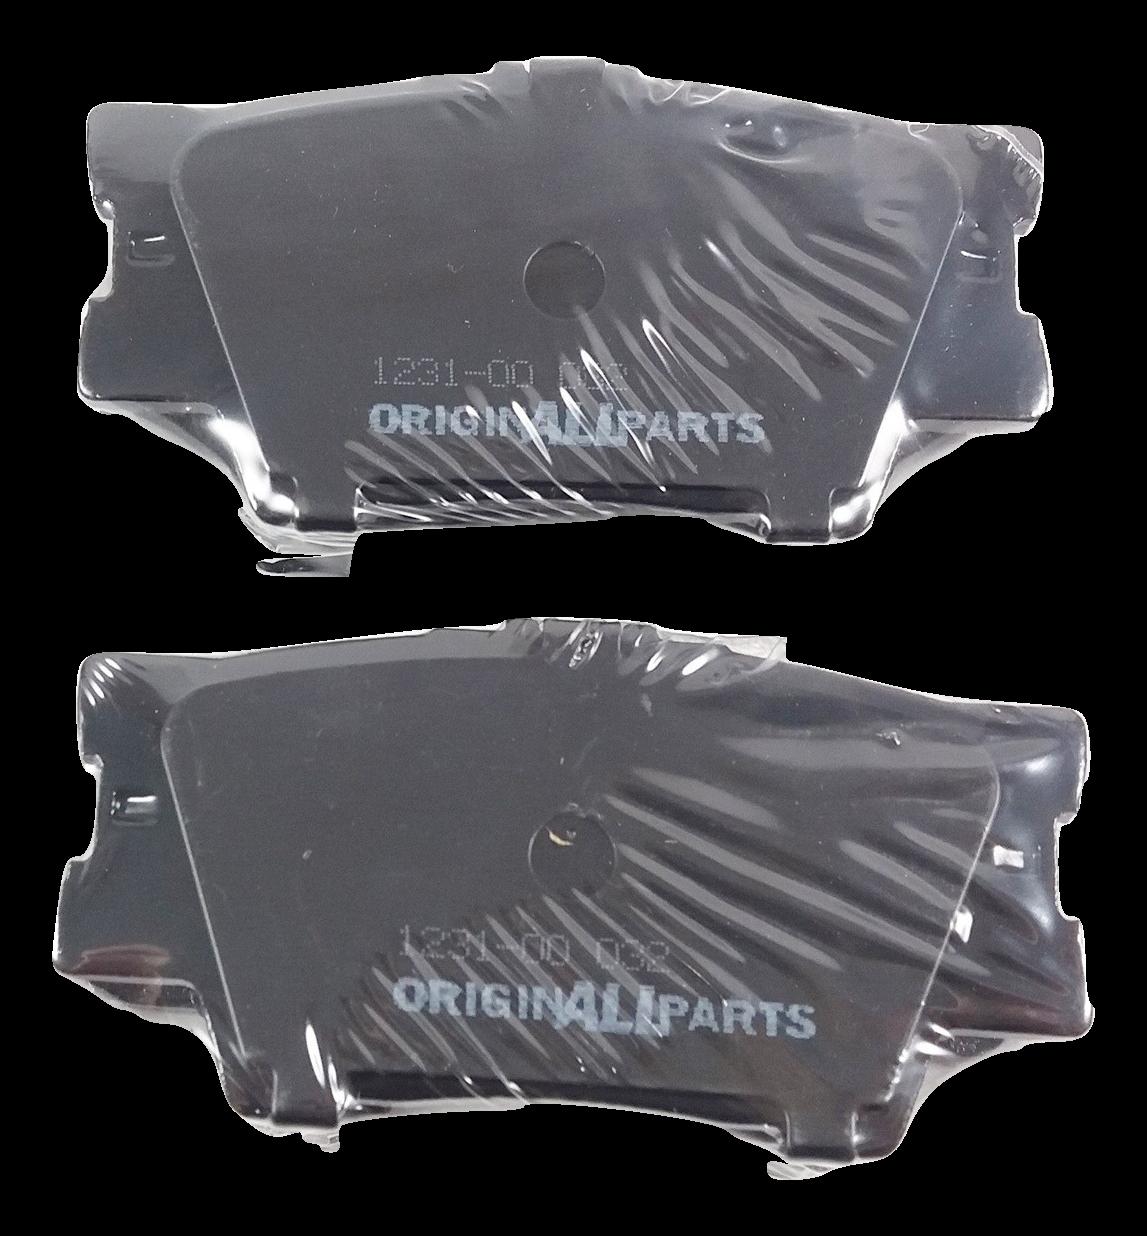 Pastilha de Freio ORIGINALLPARTS - LEXUS ES 350 / TOYOTA Camry / RAV4 - Traseira - OSTA2800